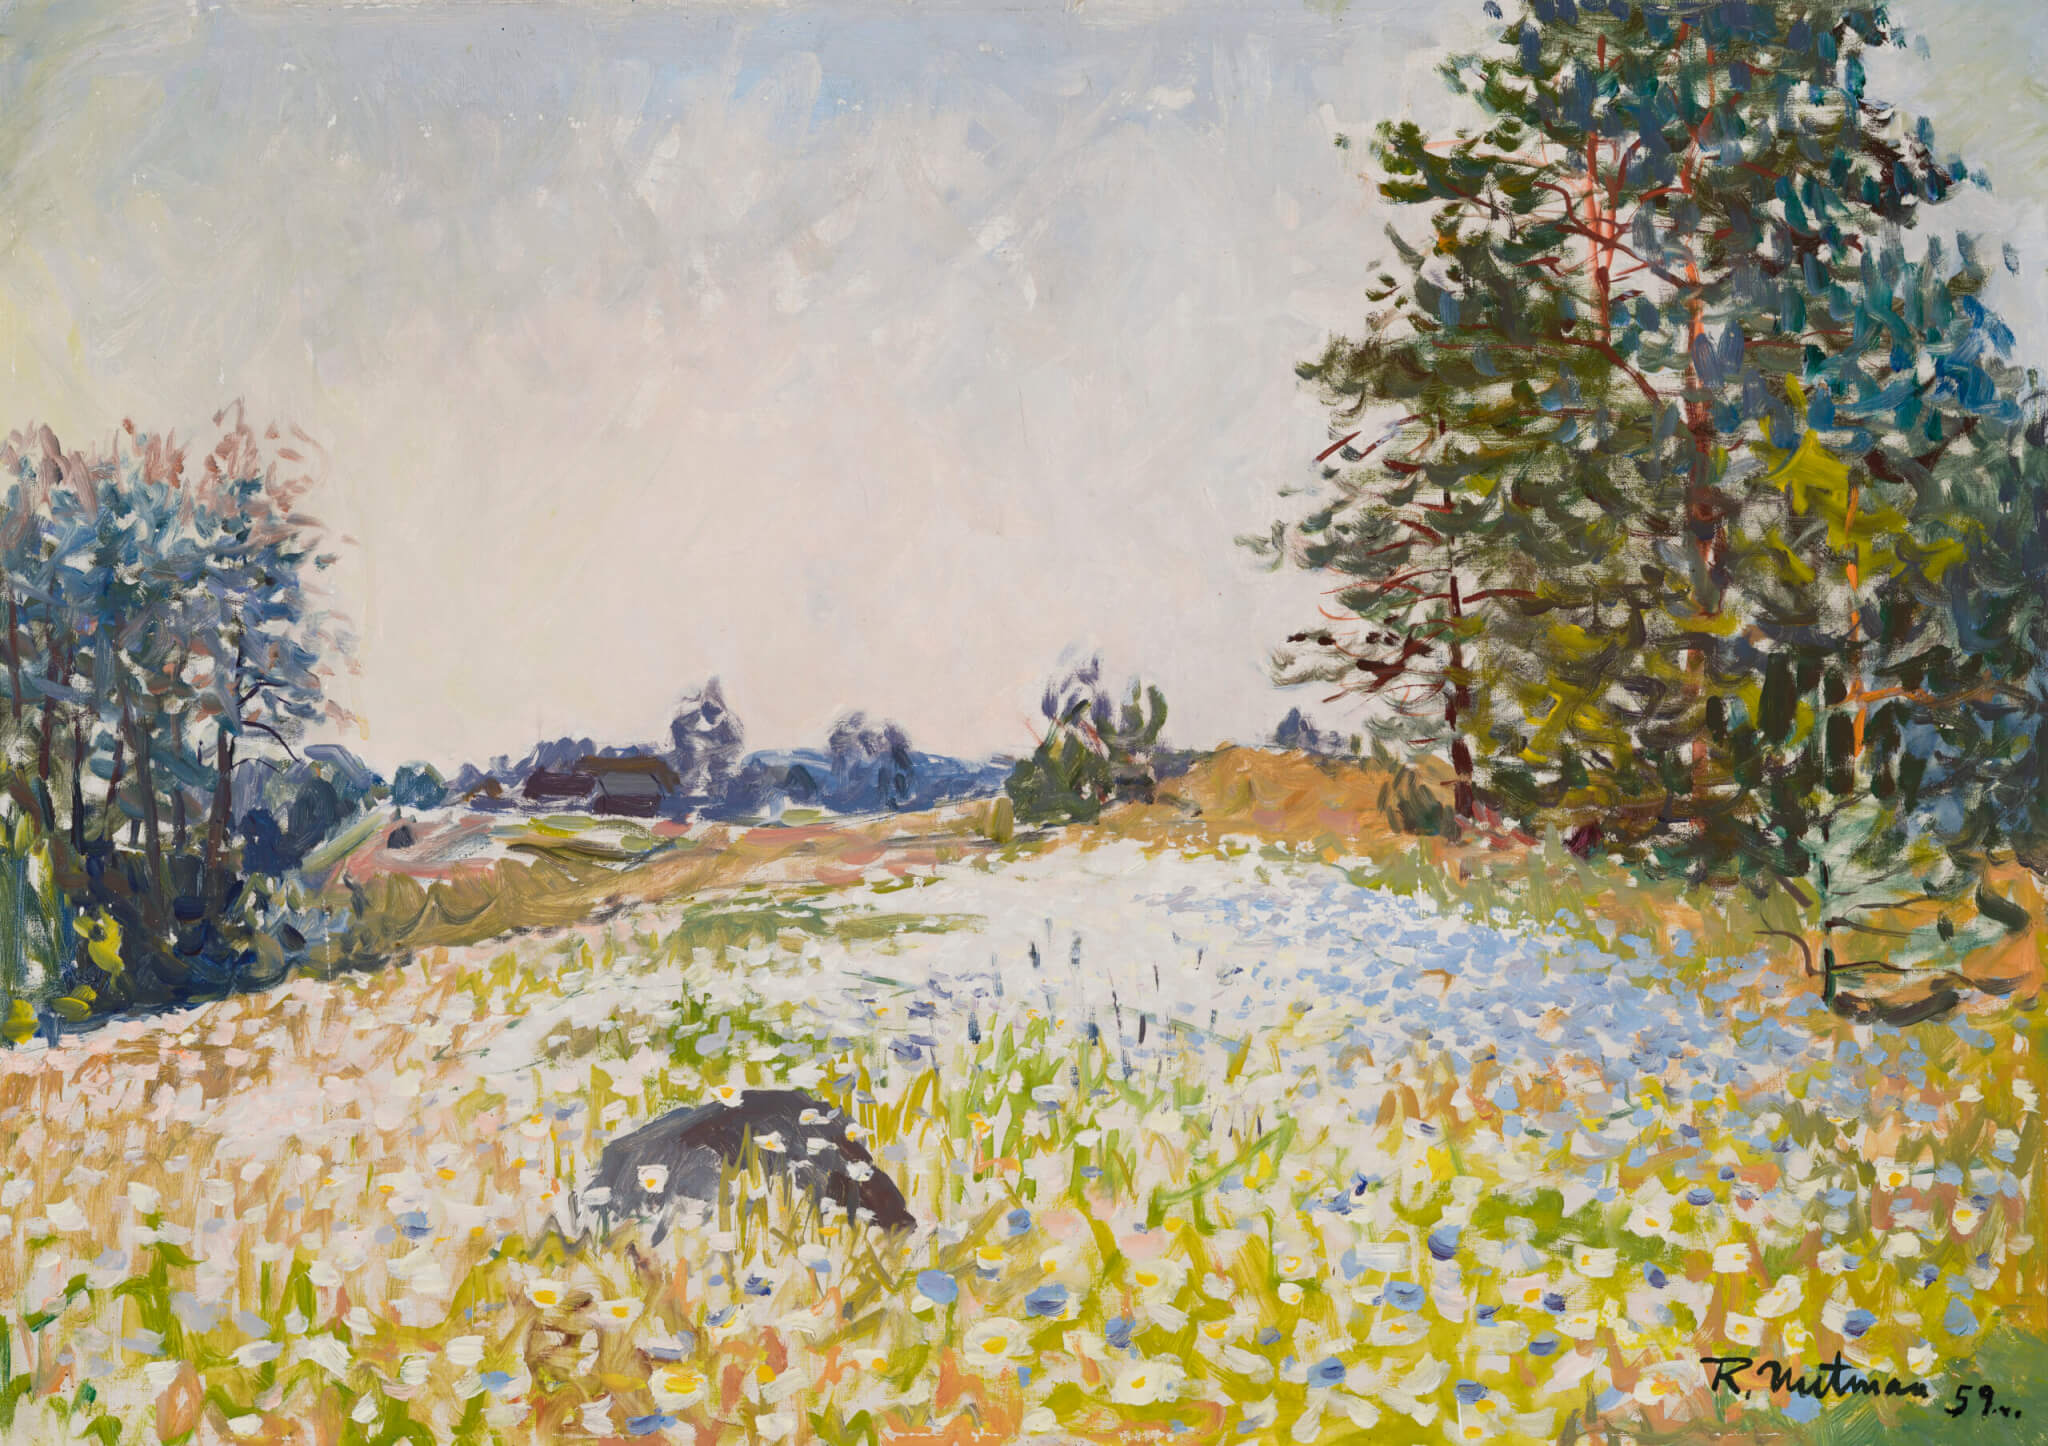 Richard-Uutmaa-Lilleväli-õlimaal-Allee